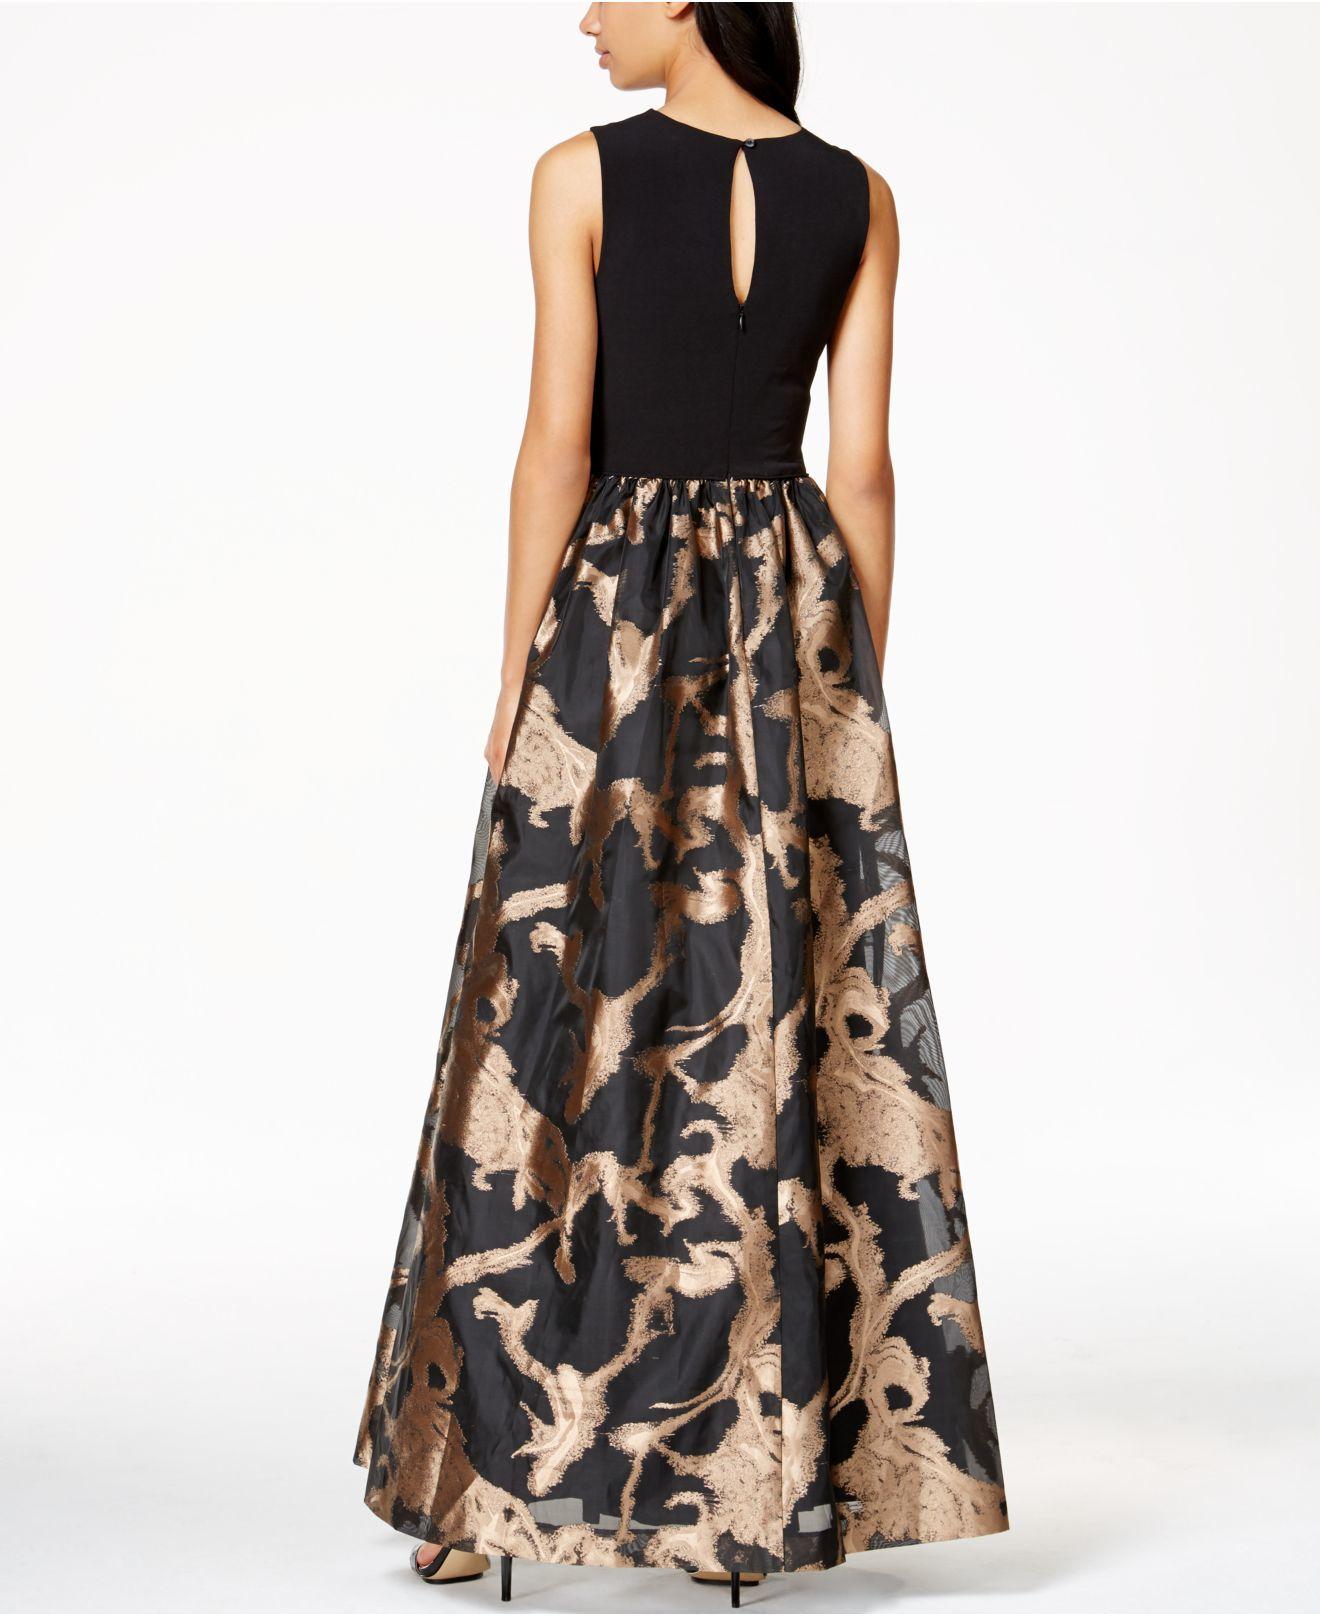 e66f3c6ed16e Calvin Klein Metallic Taffeta Gown in Black - Lyst